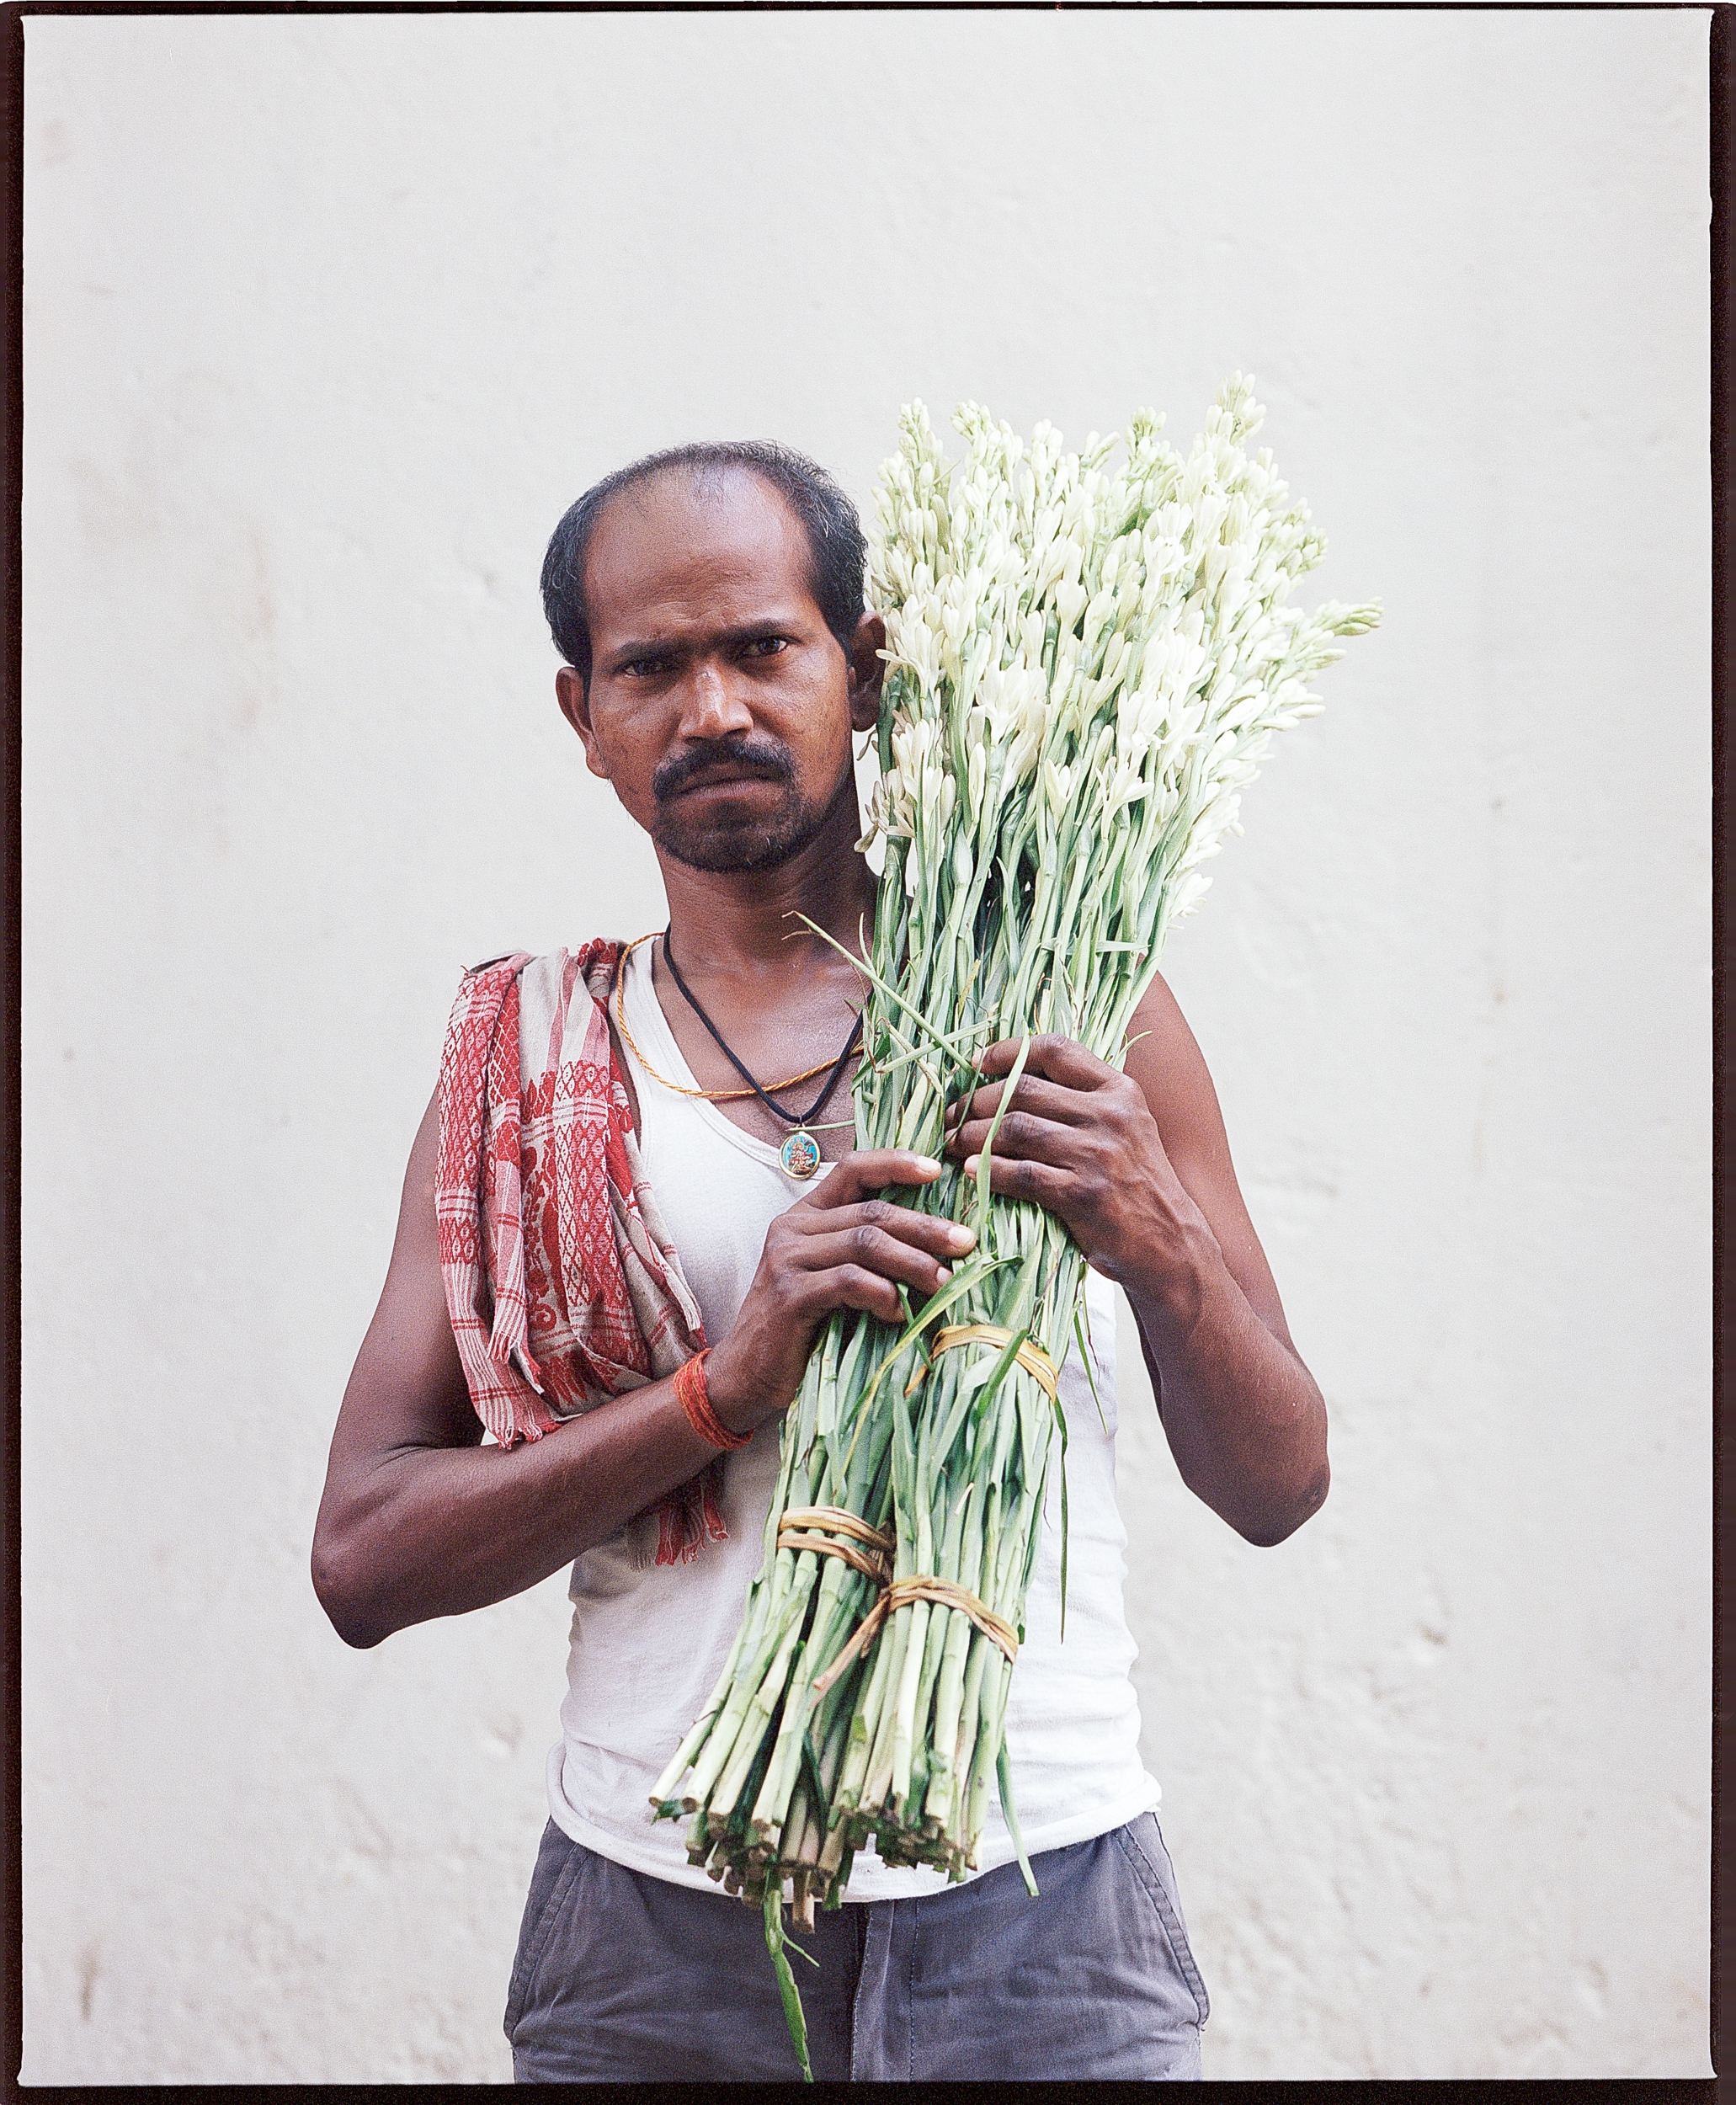 Kolkata_Flowers-12.jpg